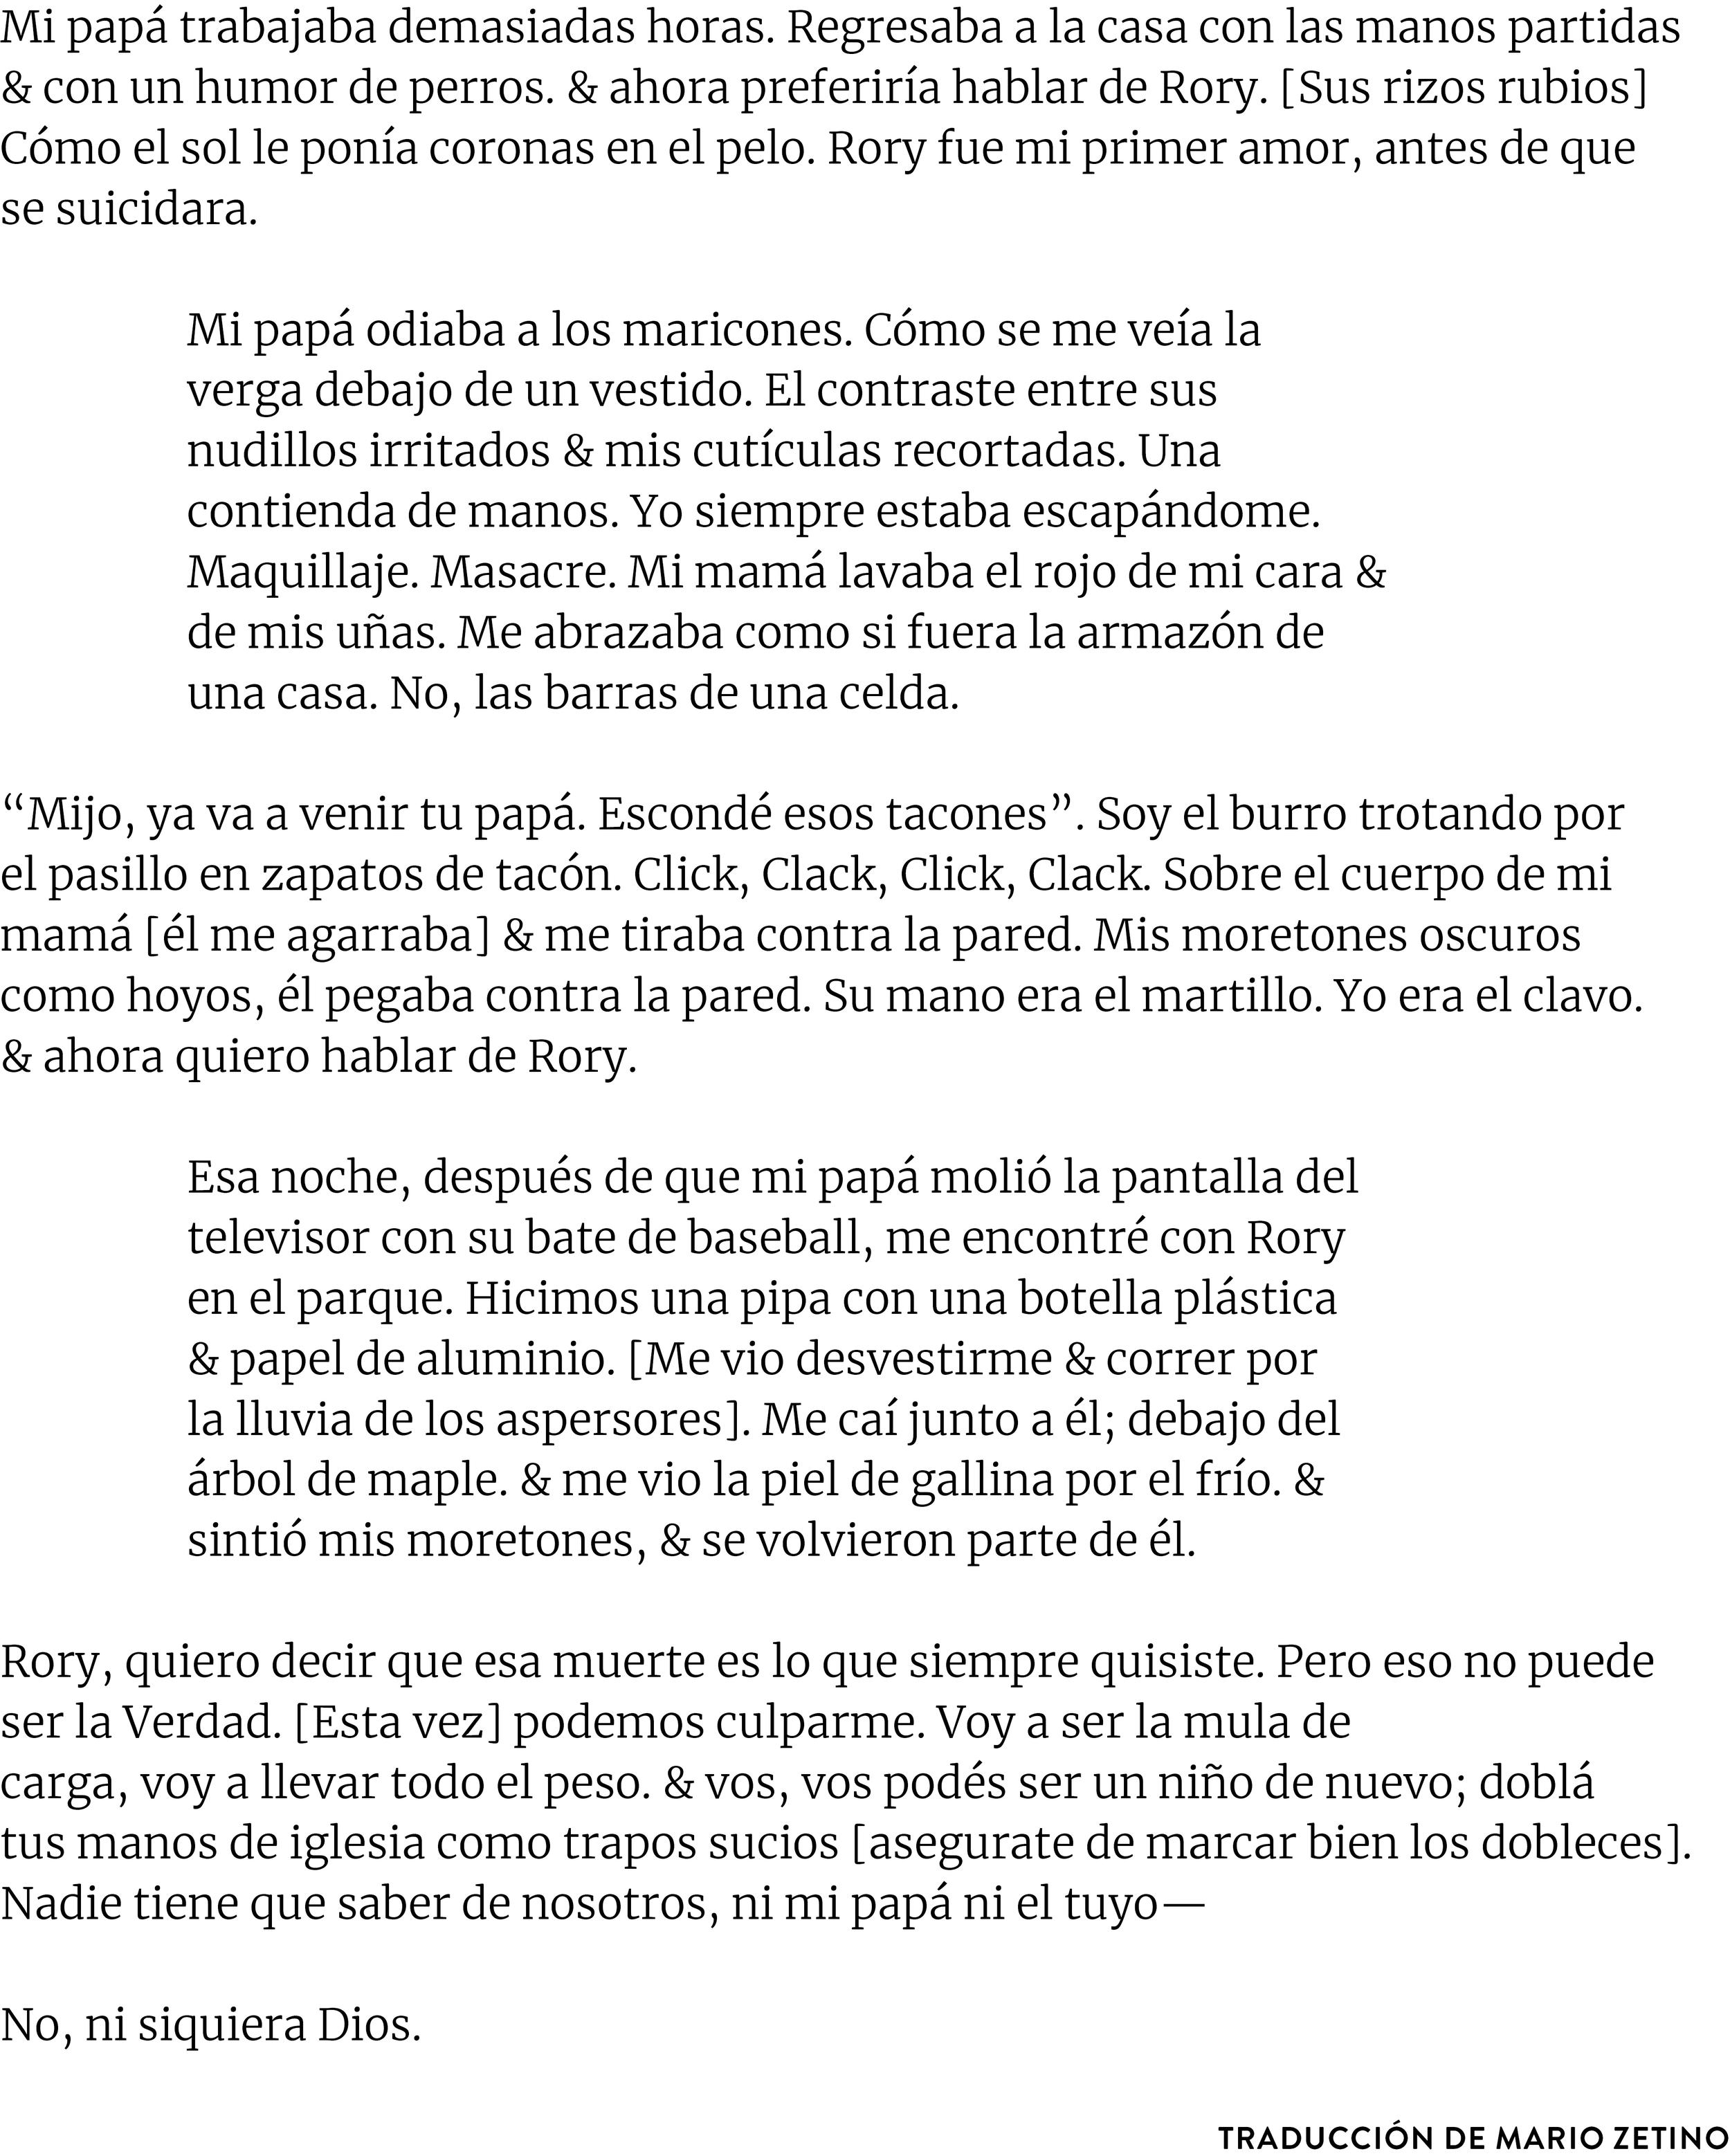 ES Christopher Soto.png